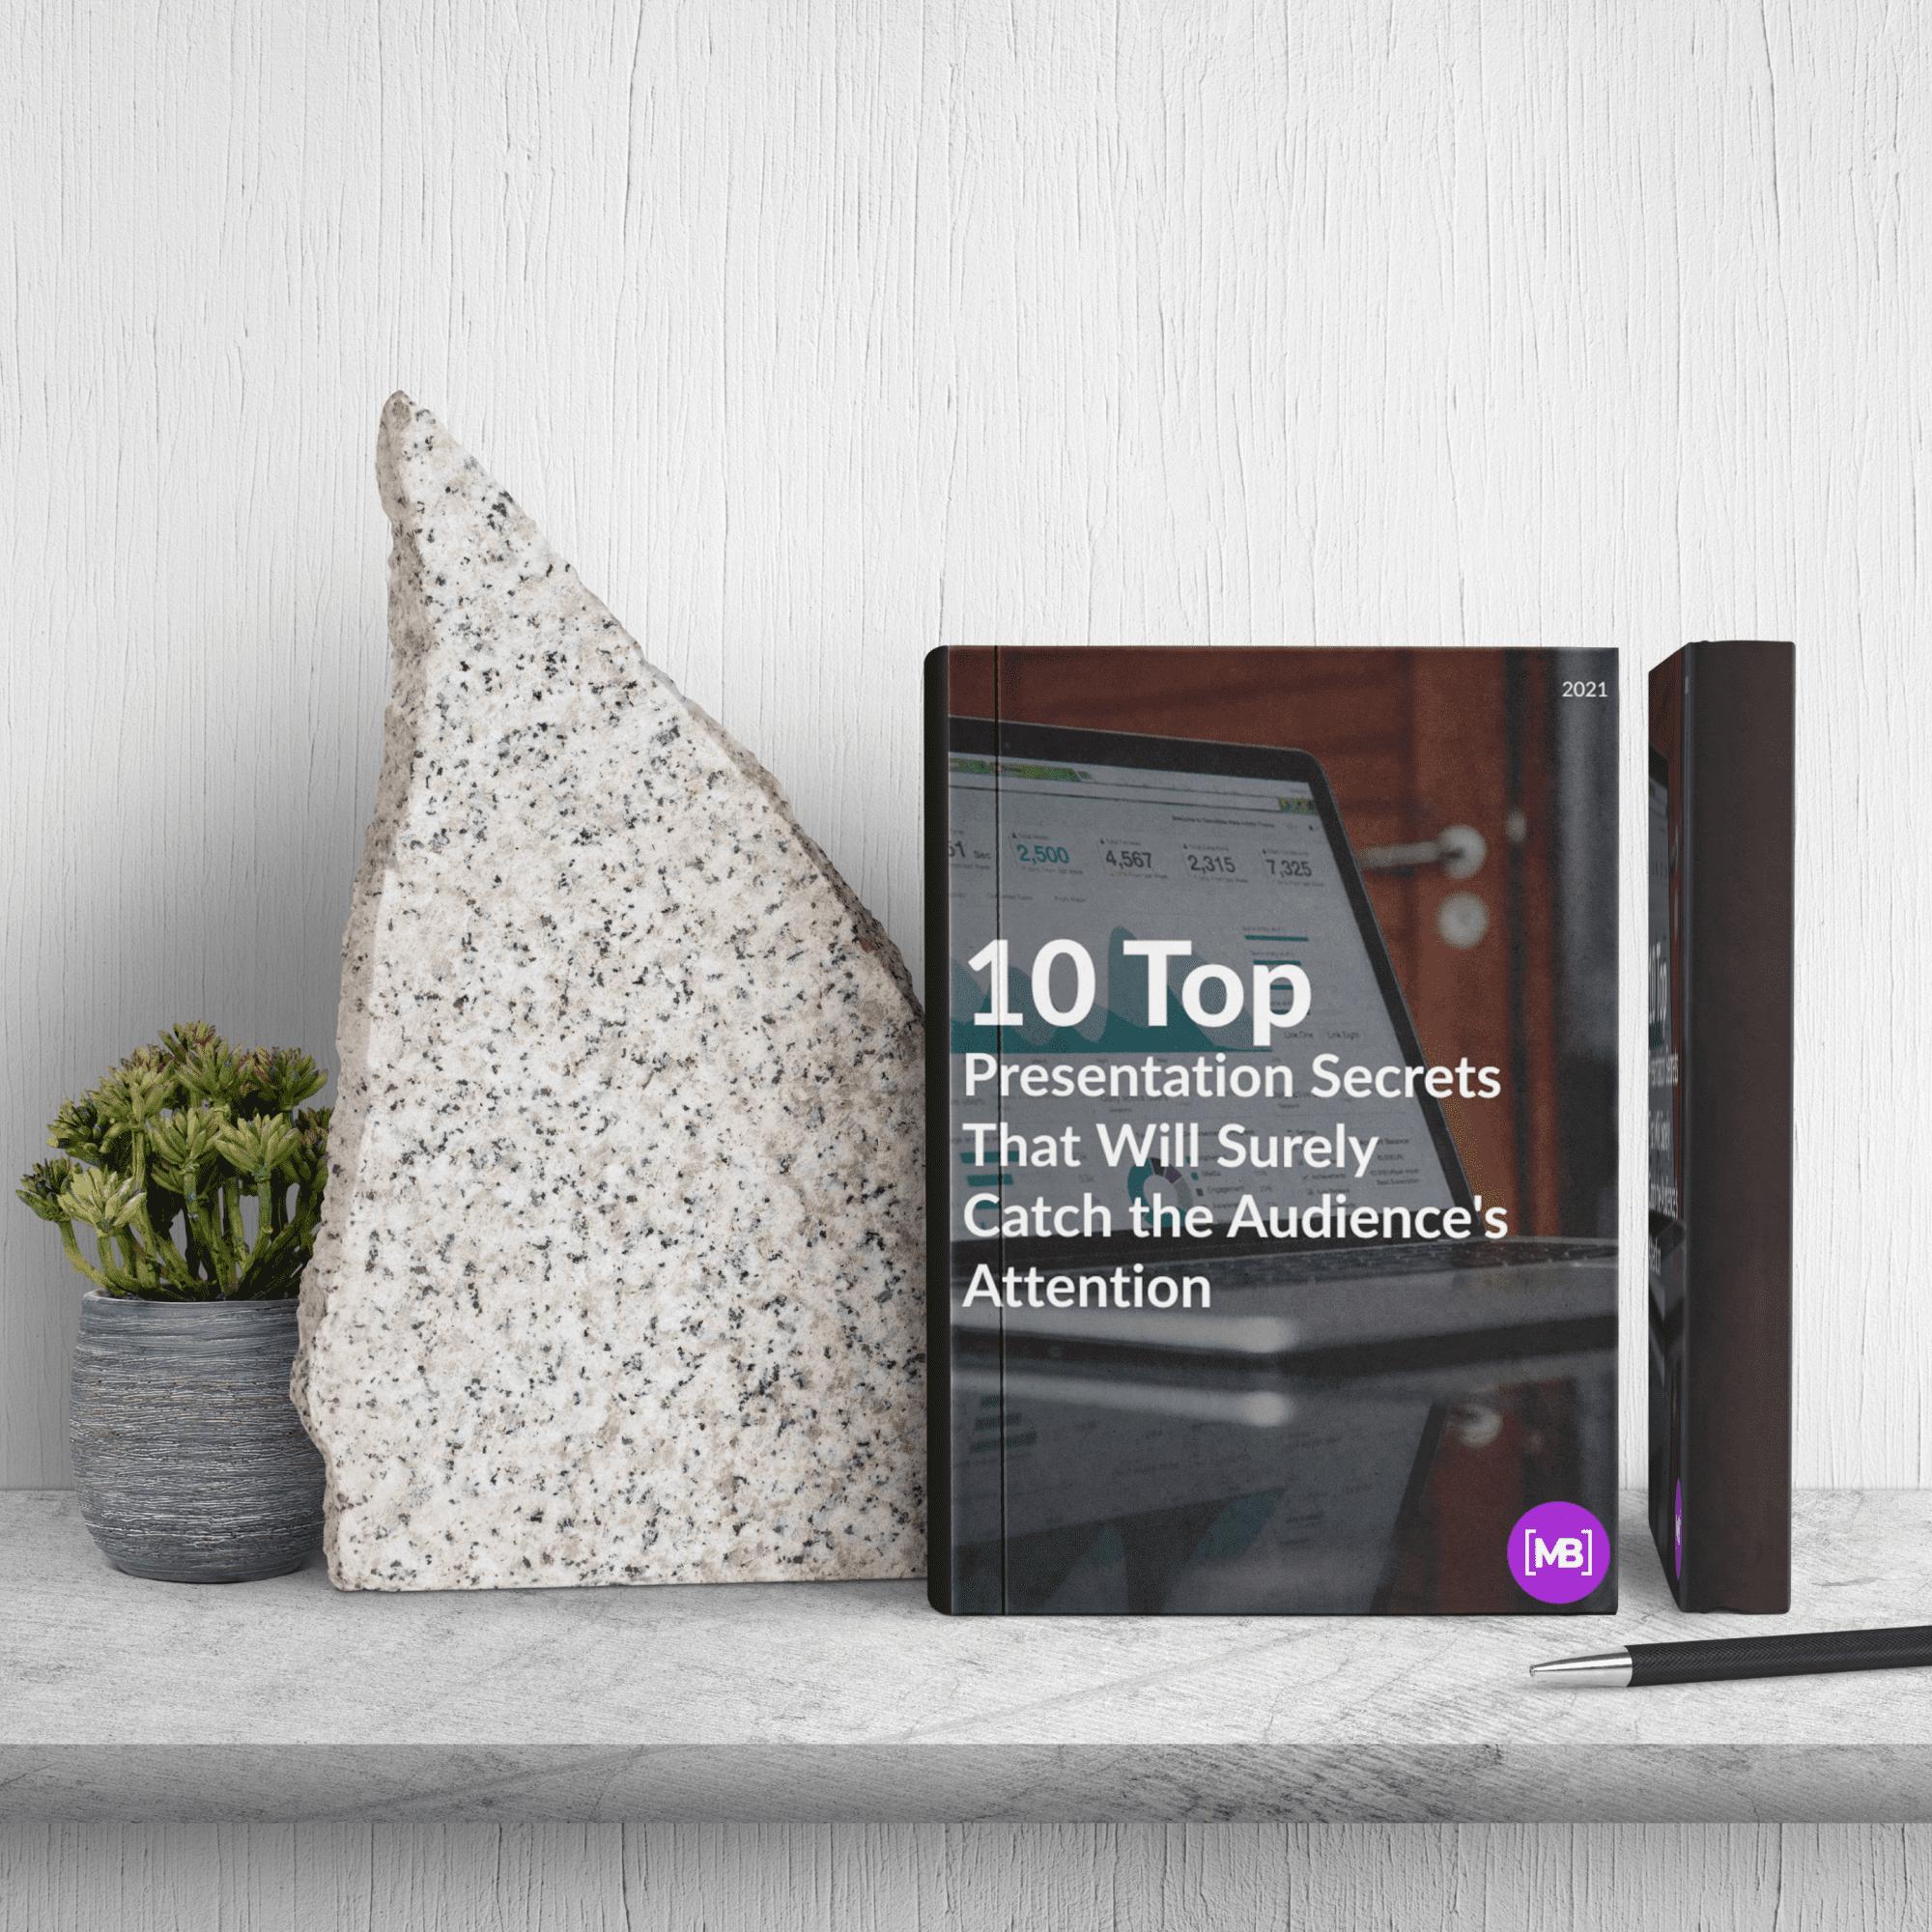 Free White Paper: 10 Top Presentation Secrets. Cover image.